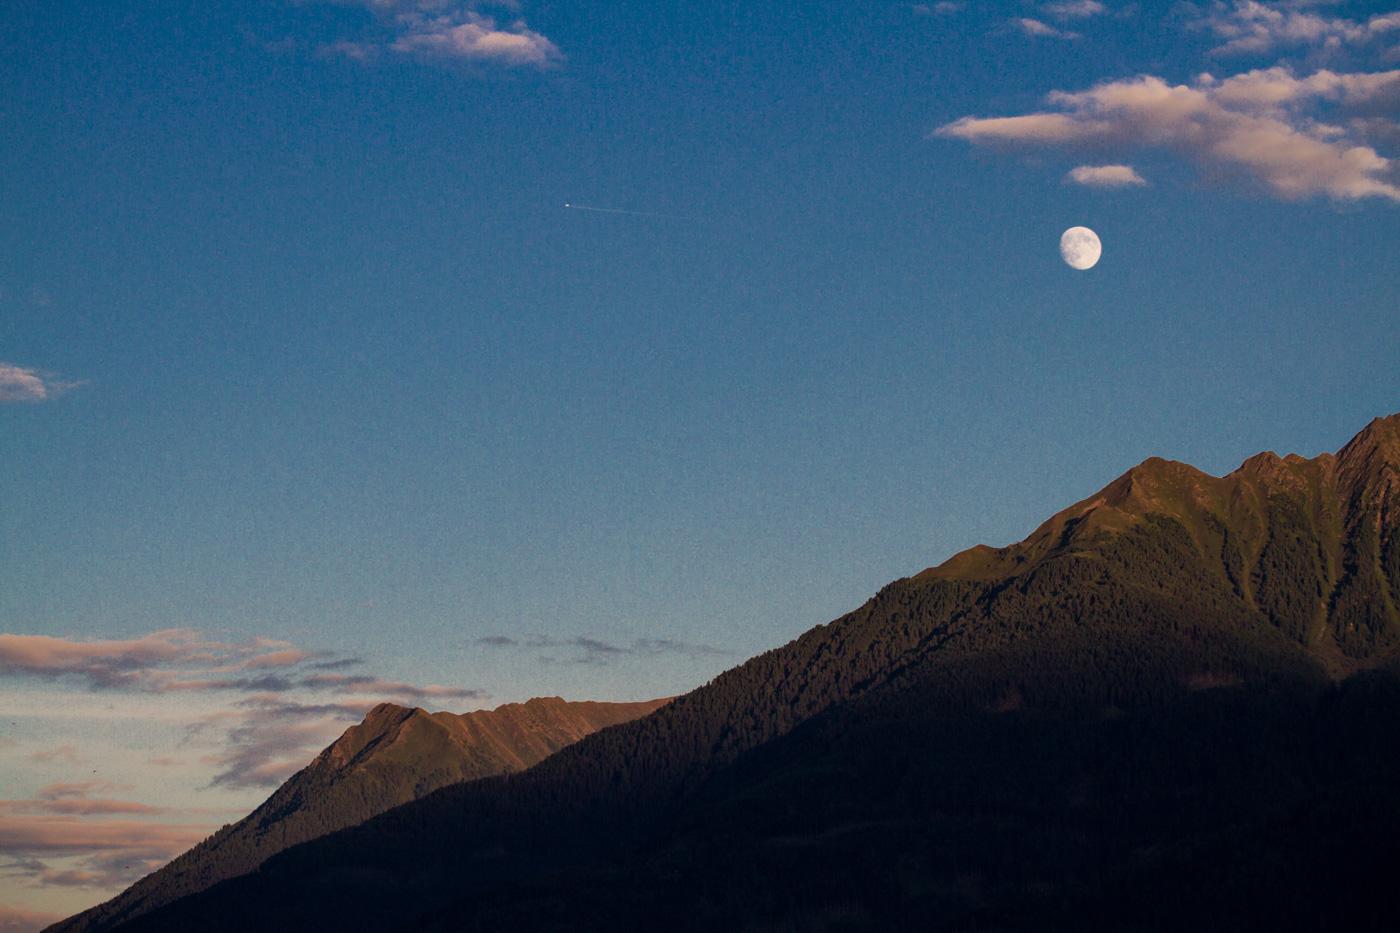 Tiroler Hintergrundbild